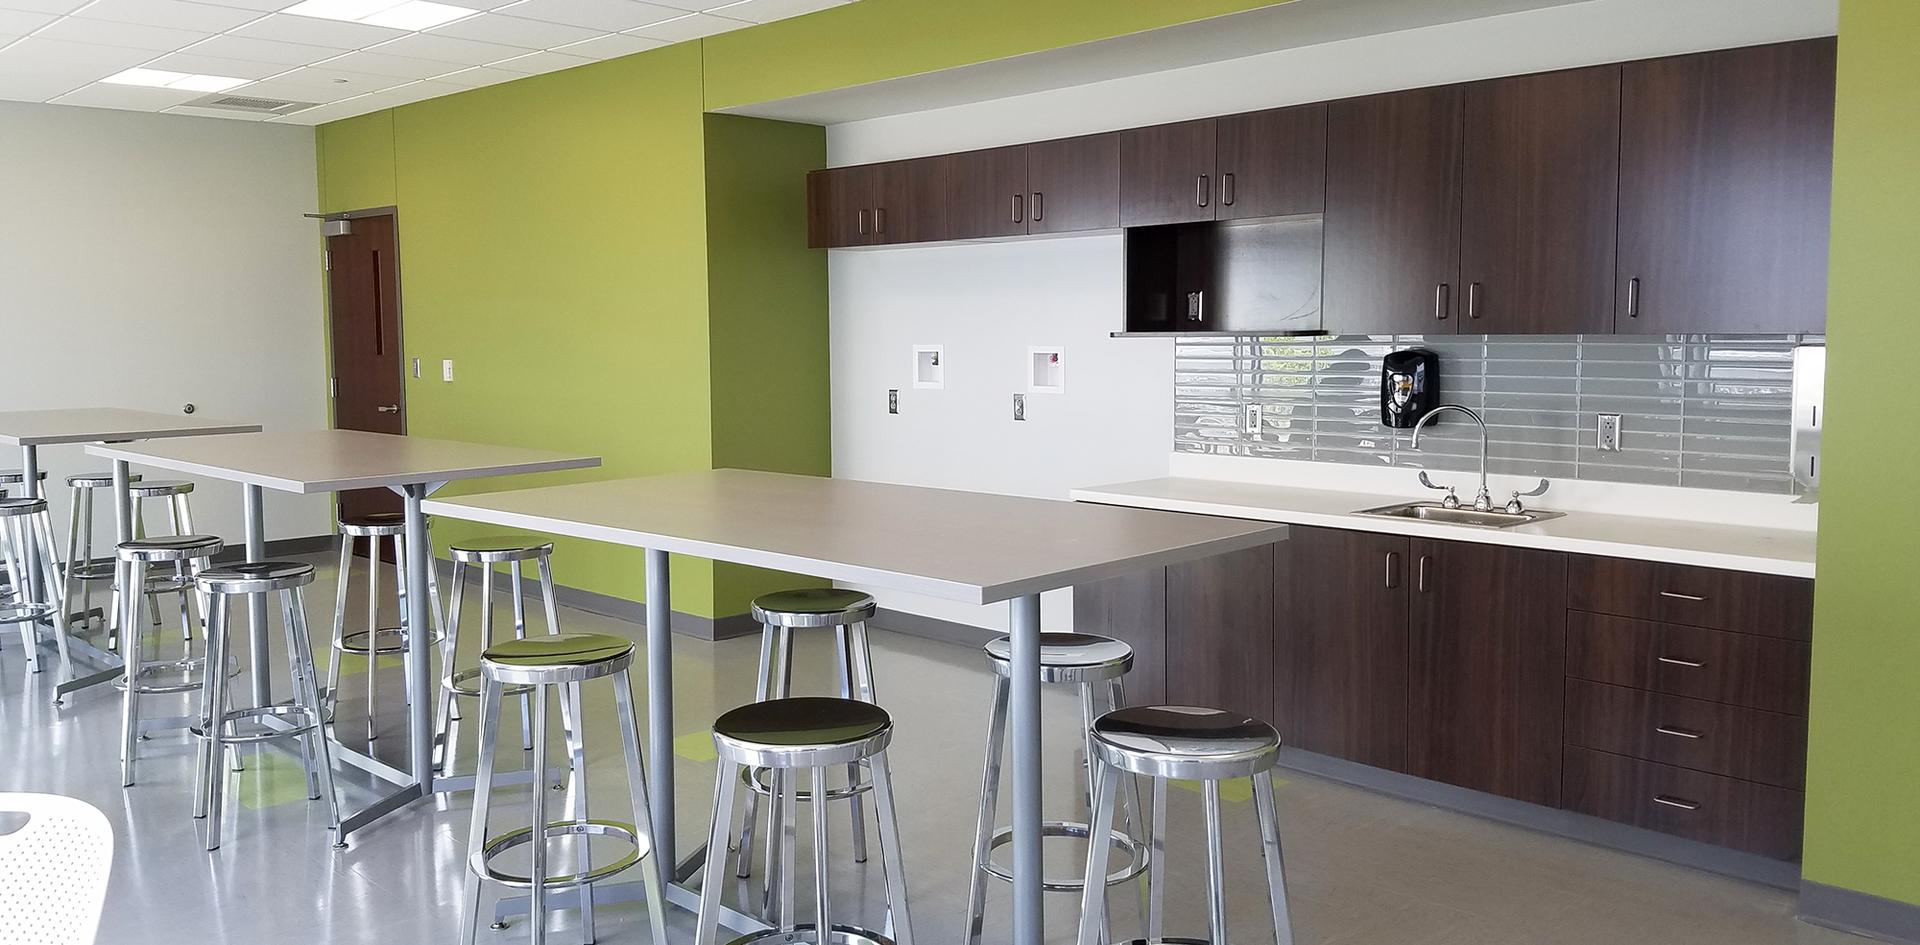 McLean County Orthopedics Breakroom